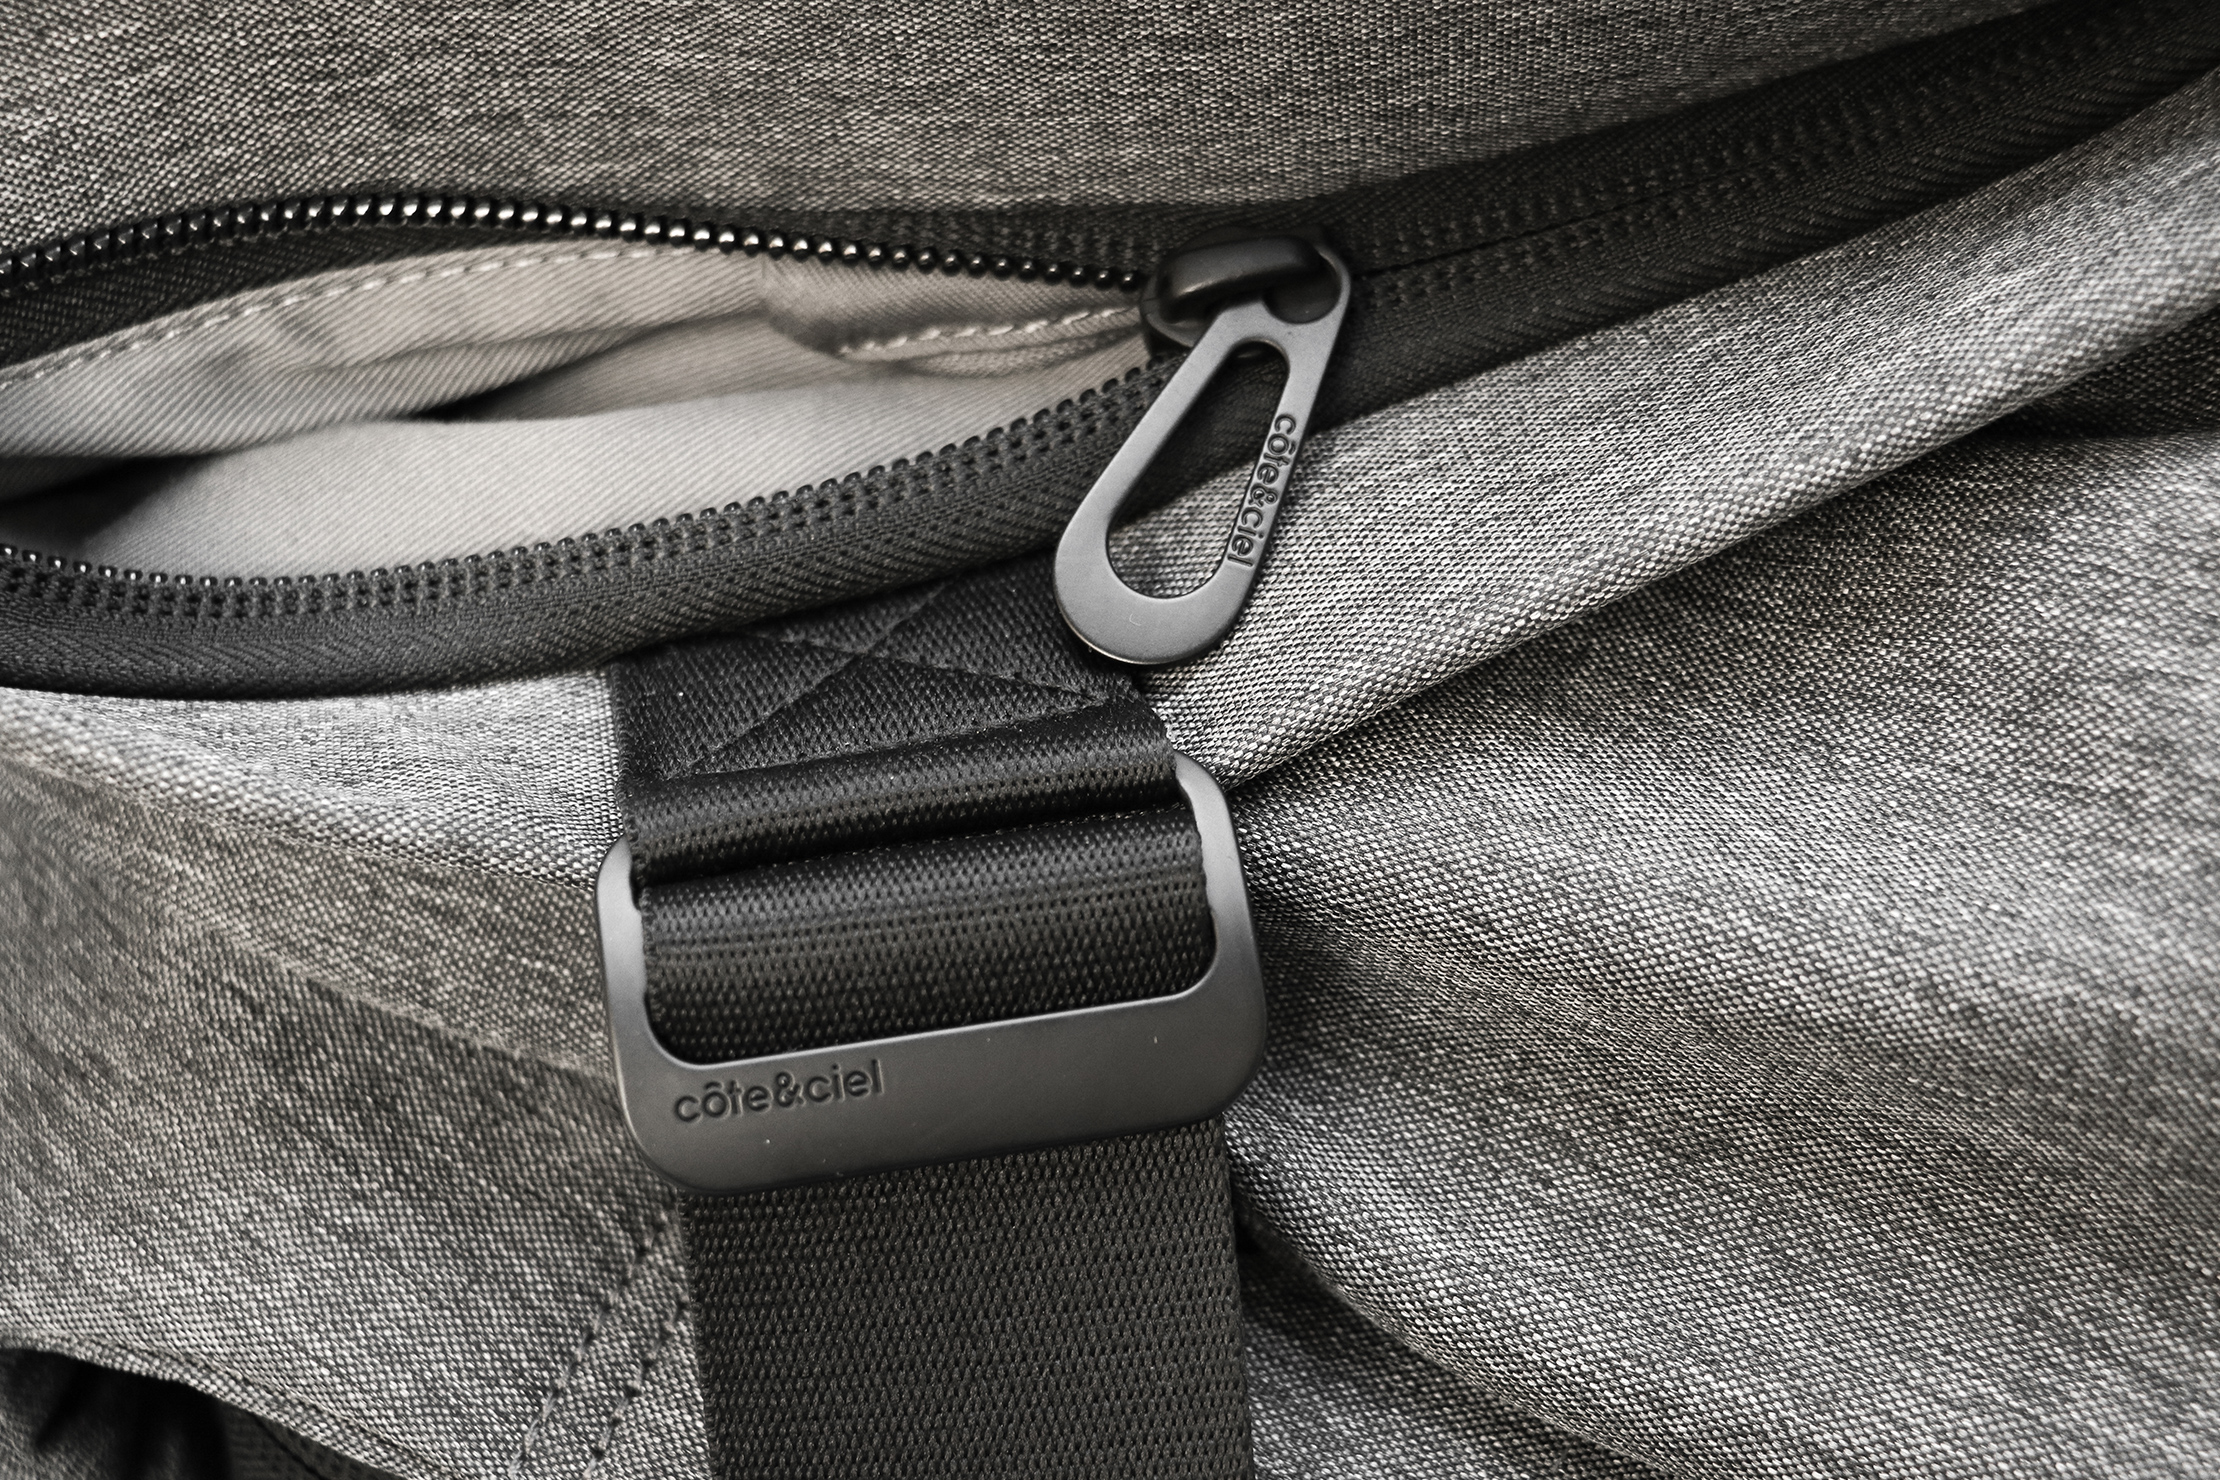 Cote&Ciel Isar M EcoYarn Grey Zippers and Hardware